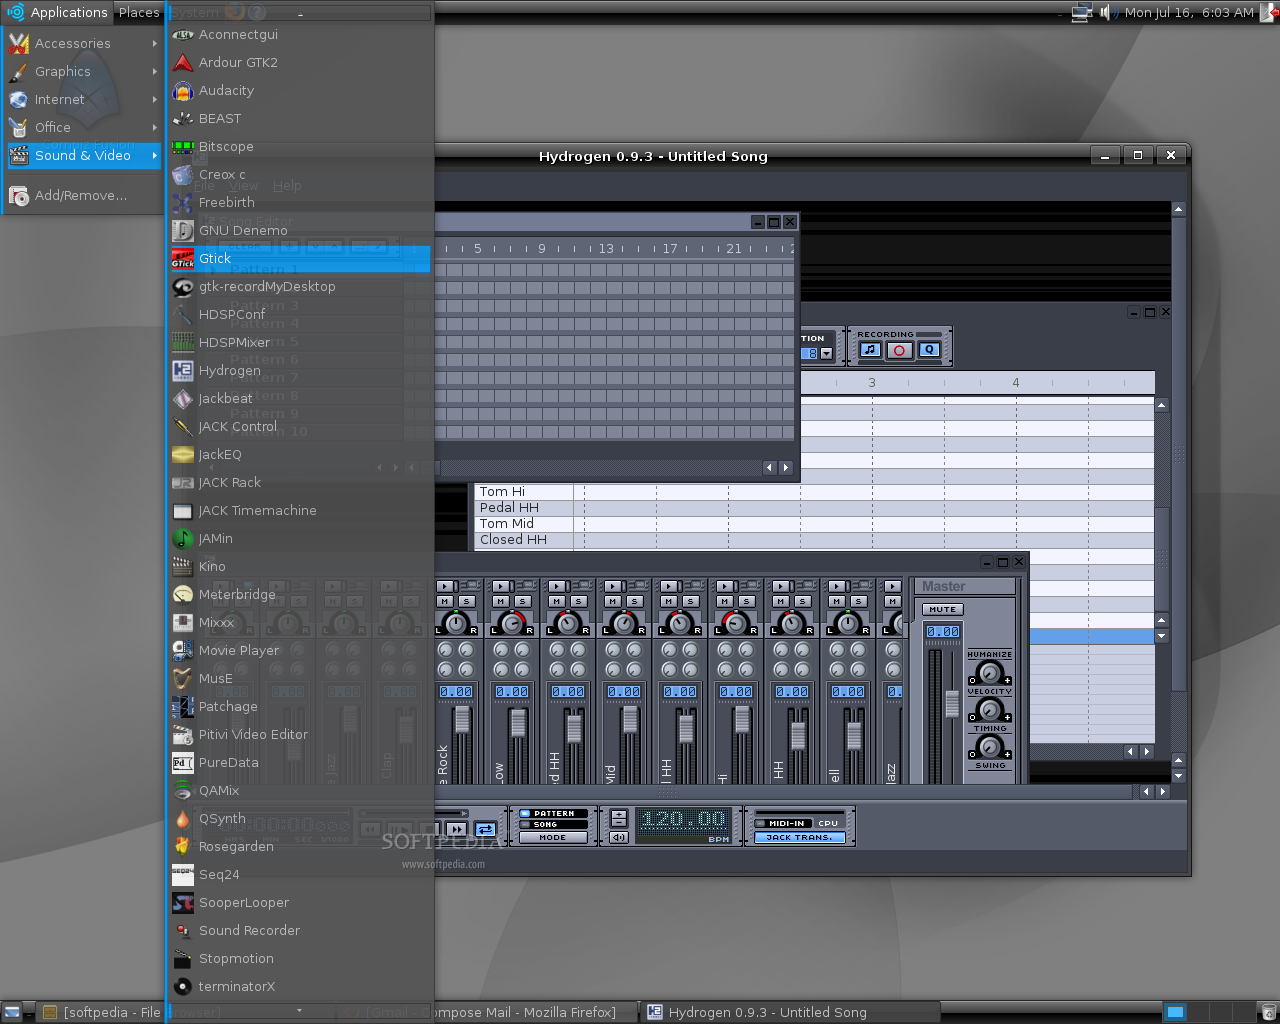 How to install compiz fusion on ubuntu studio ubuntu studio with compiz fusion stopboris Choice Image